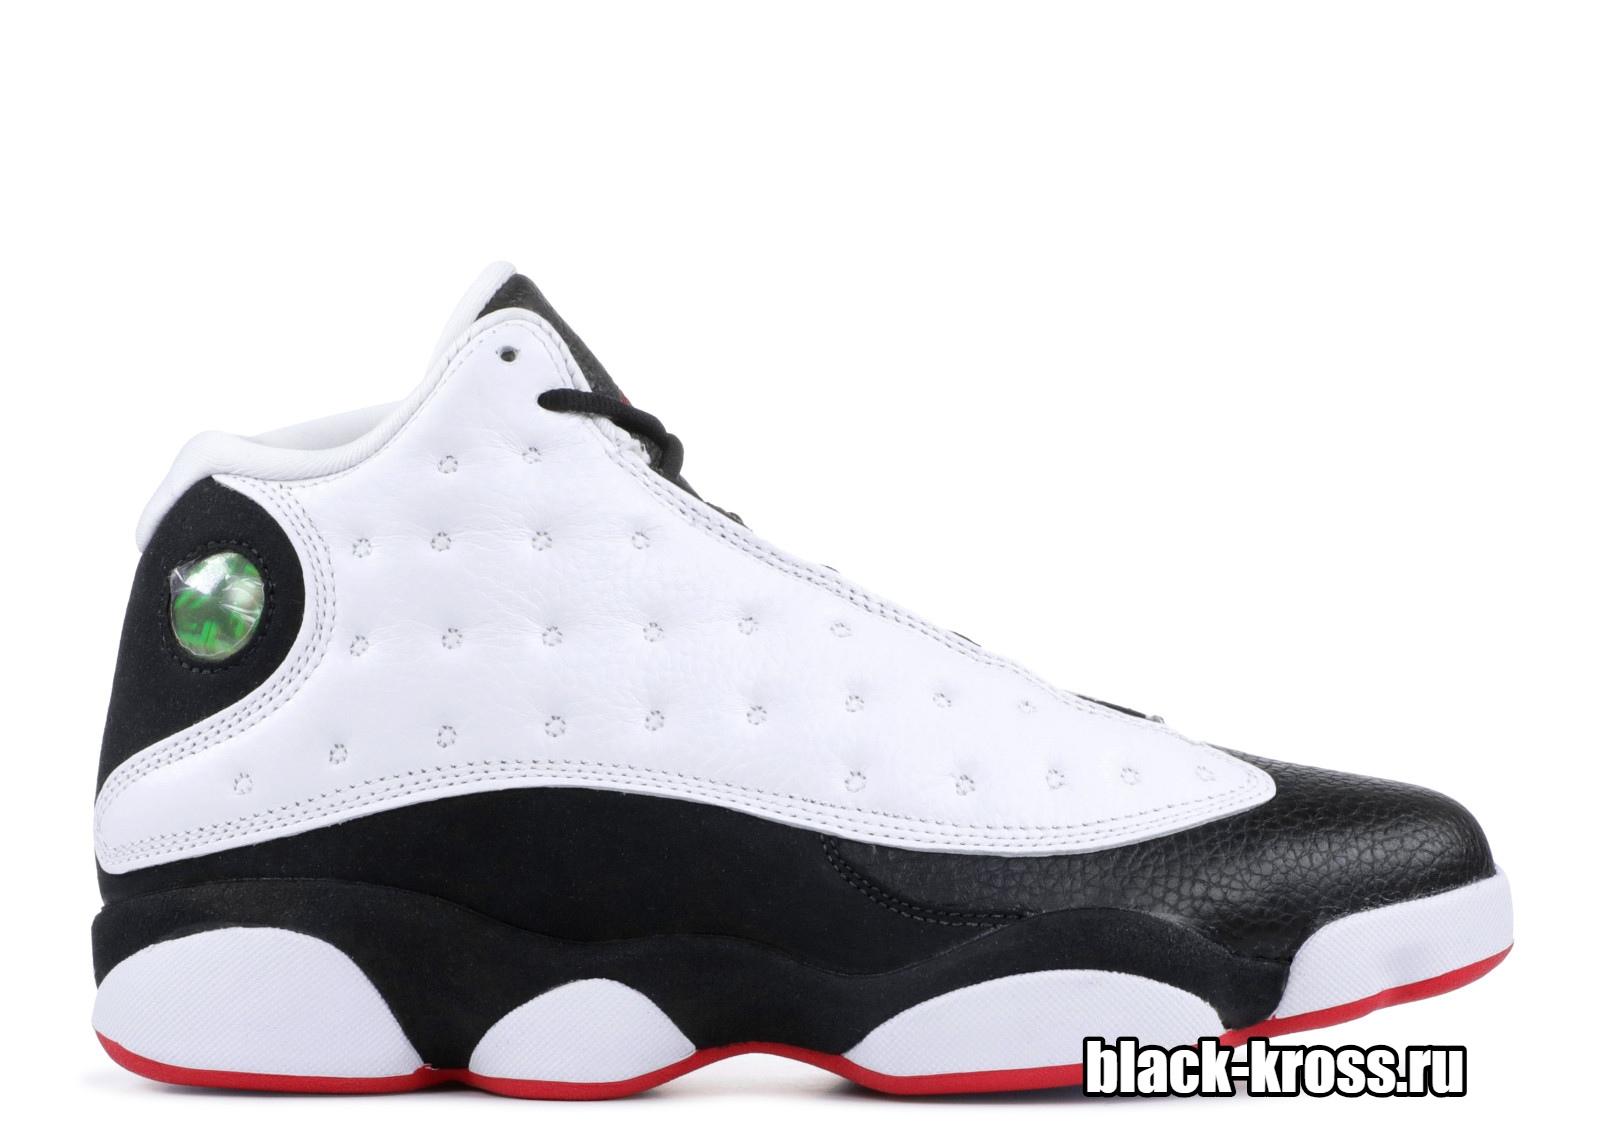 NIKE AIR JORDAN XIII RETRO White & Black (41-46)